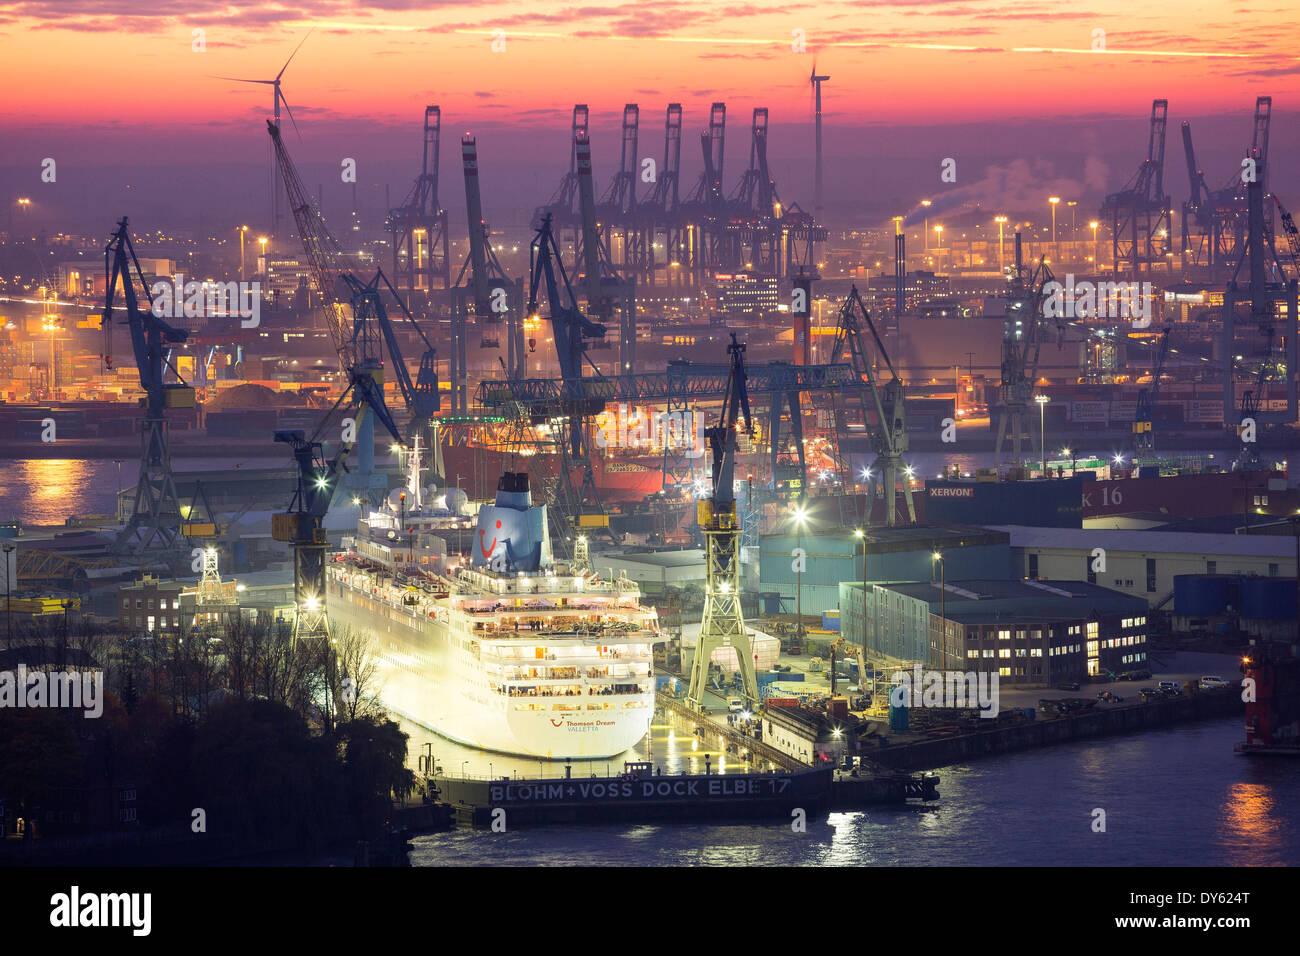 View towards Blohm and Voss Dock Elbe 17, Hamburg Harbour, Hanseatic City of Hamburg, Germany, Europe - Stock Image